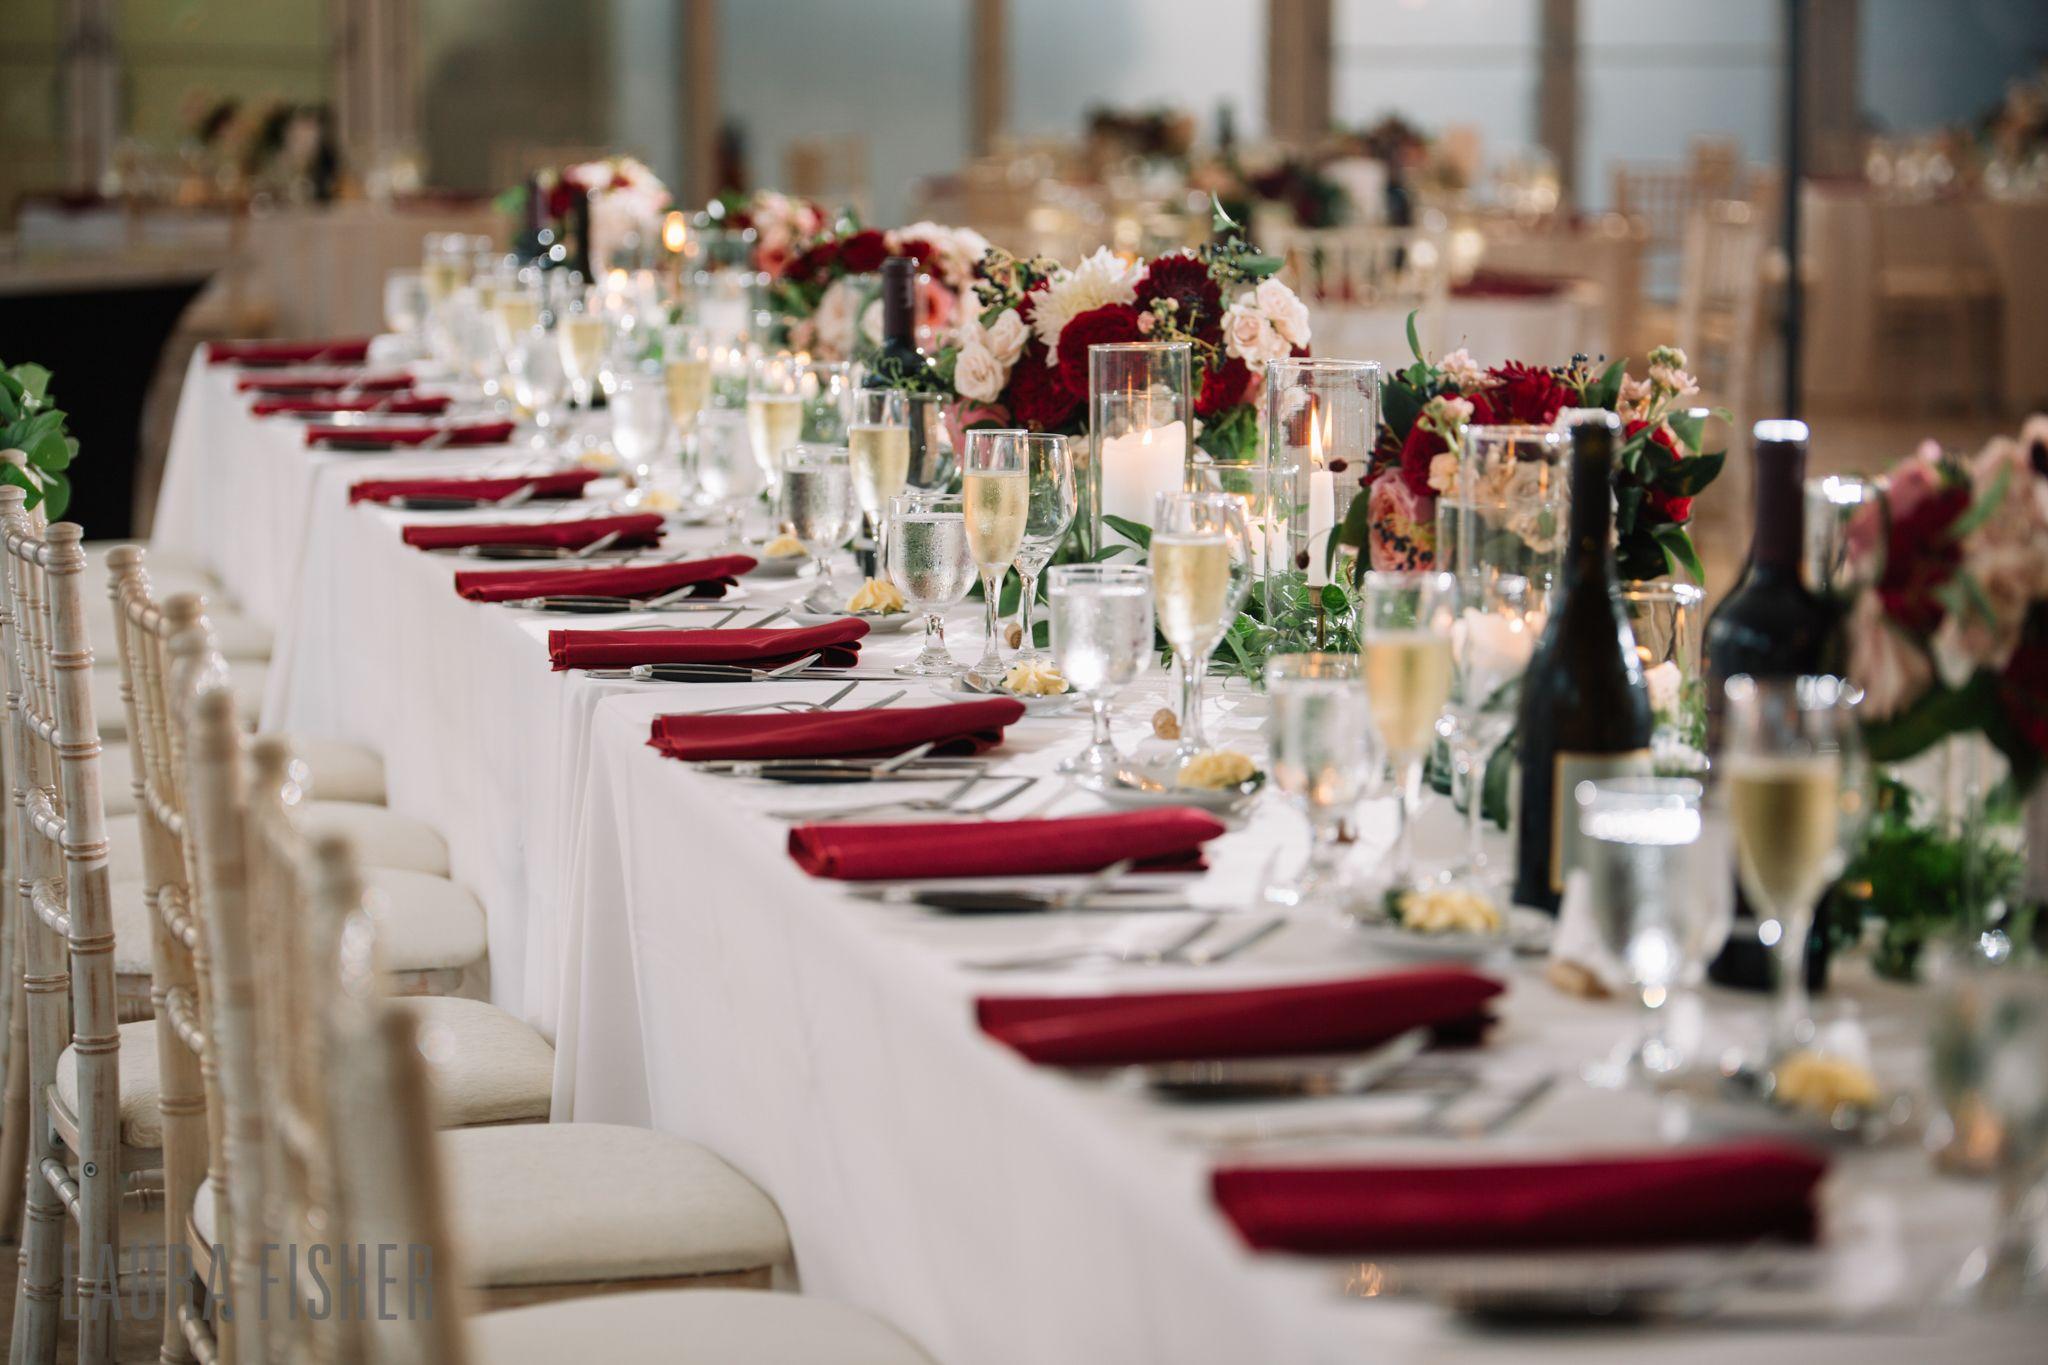 galleria-marchetti-wedding-chicago-laura-fisher-photography-0117-2.jpg